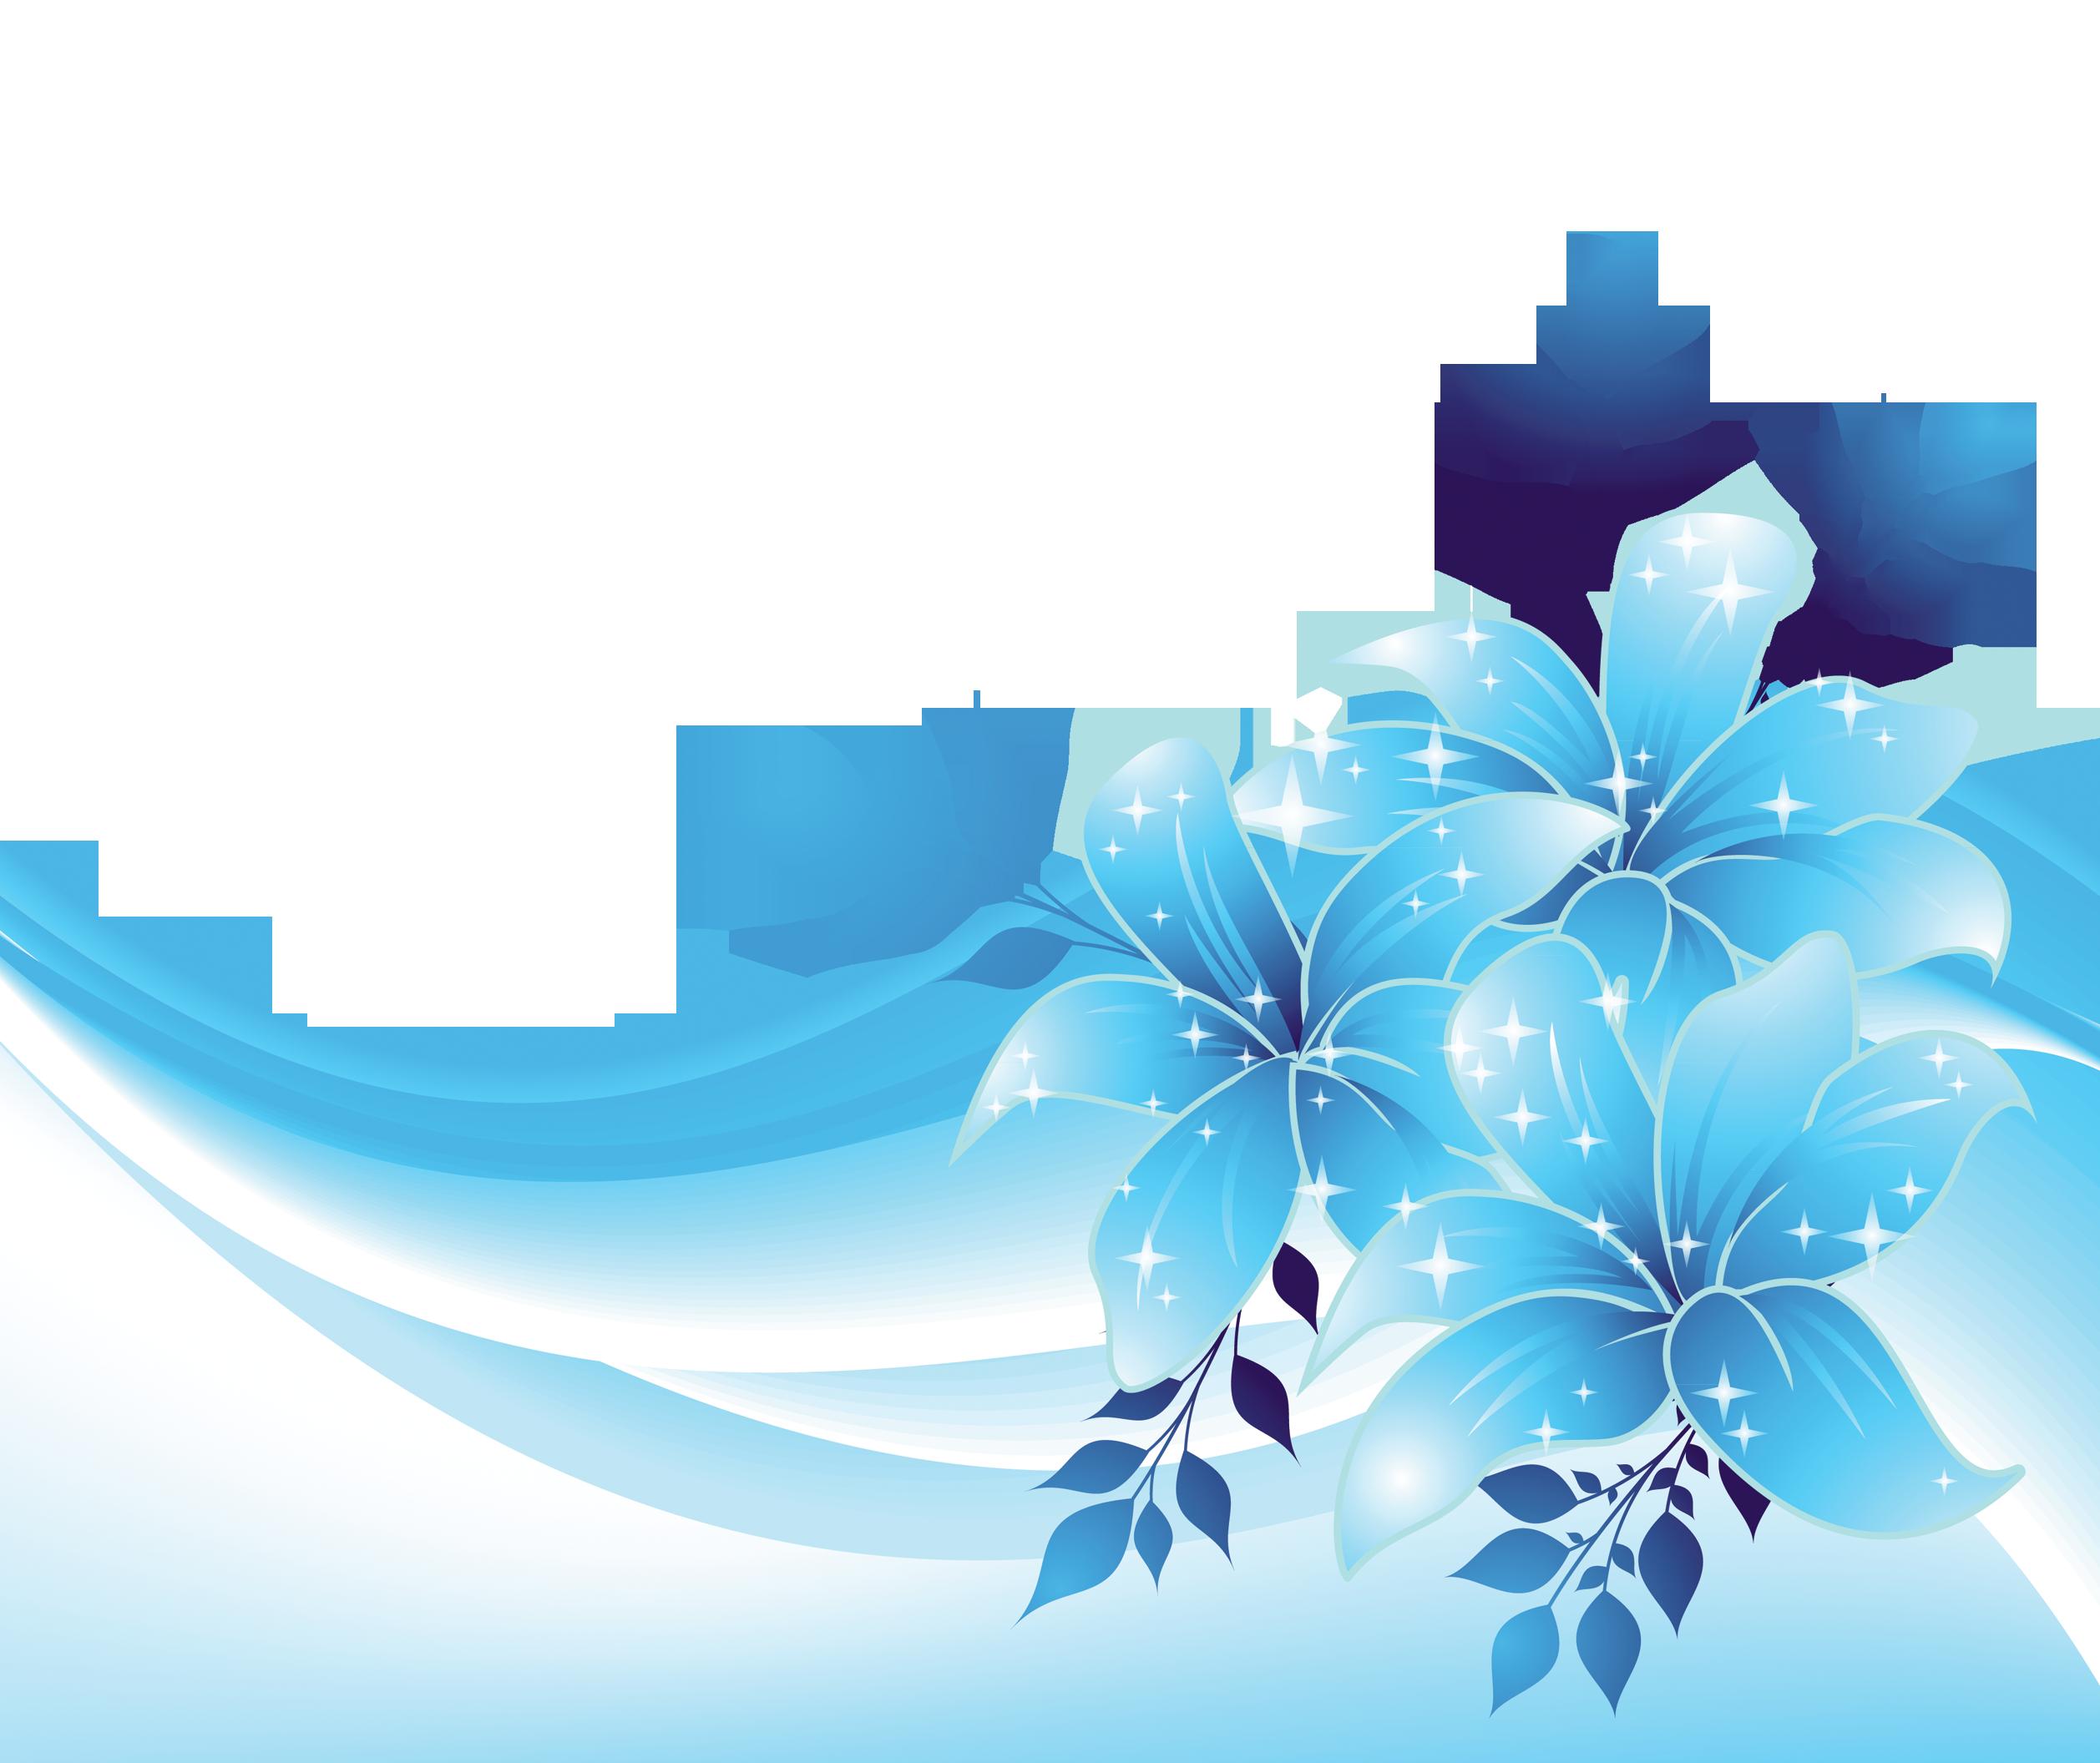 Blue Decoration with Flowers PNG Transparent Clipart.